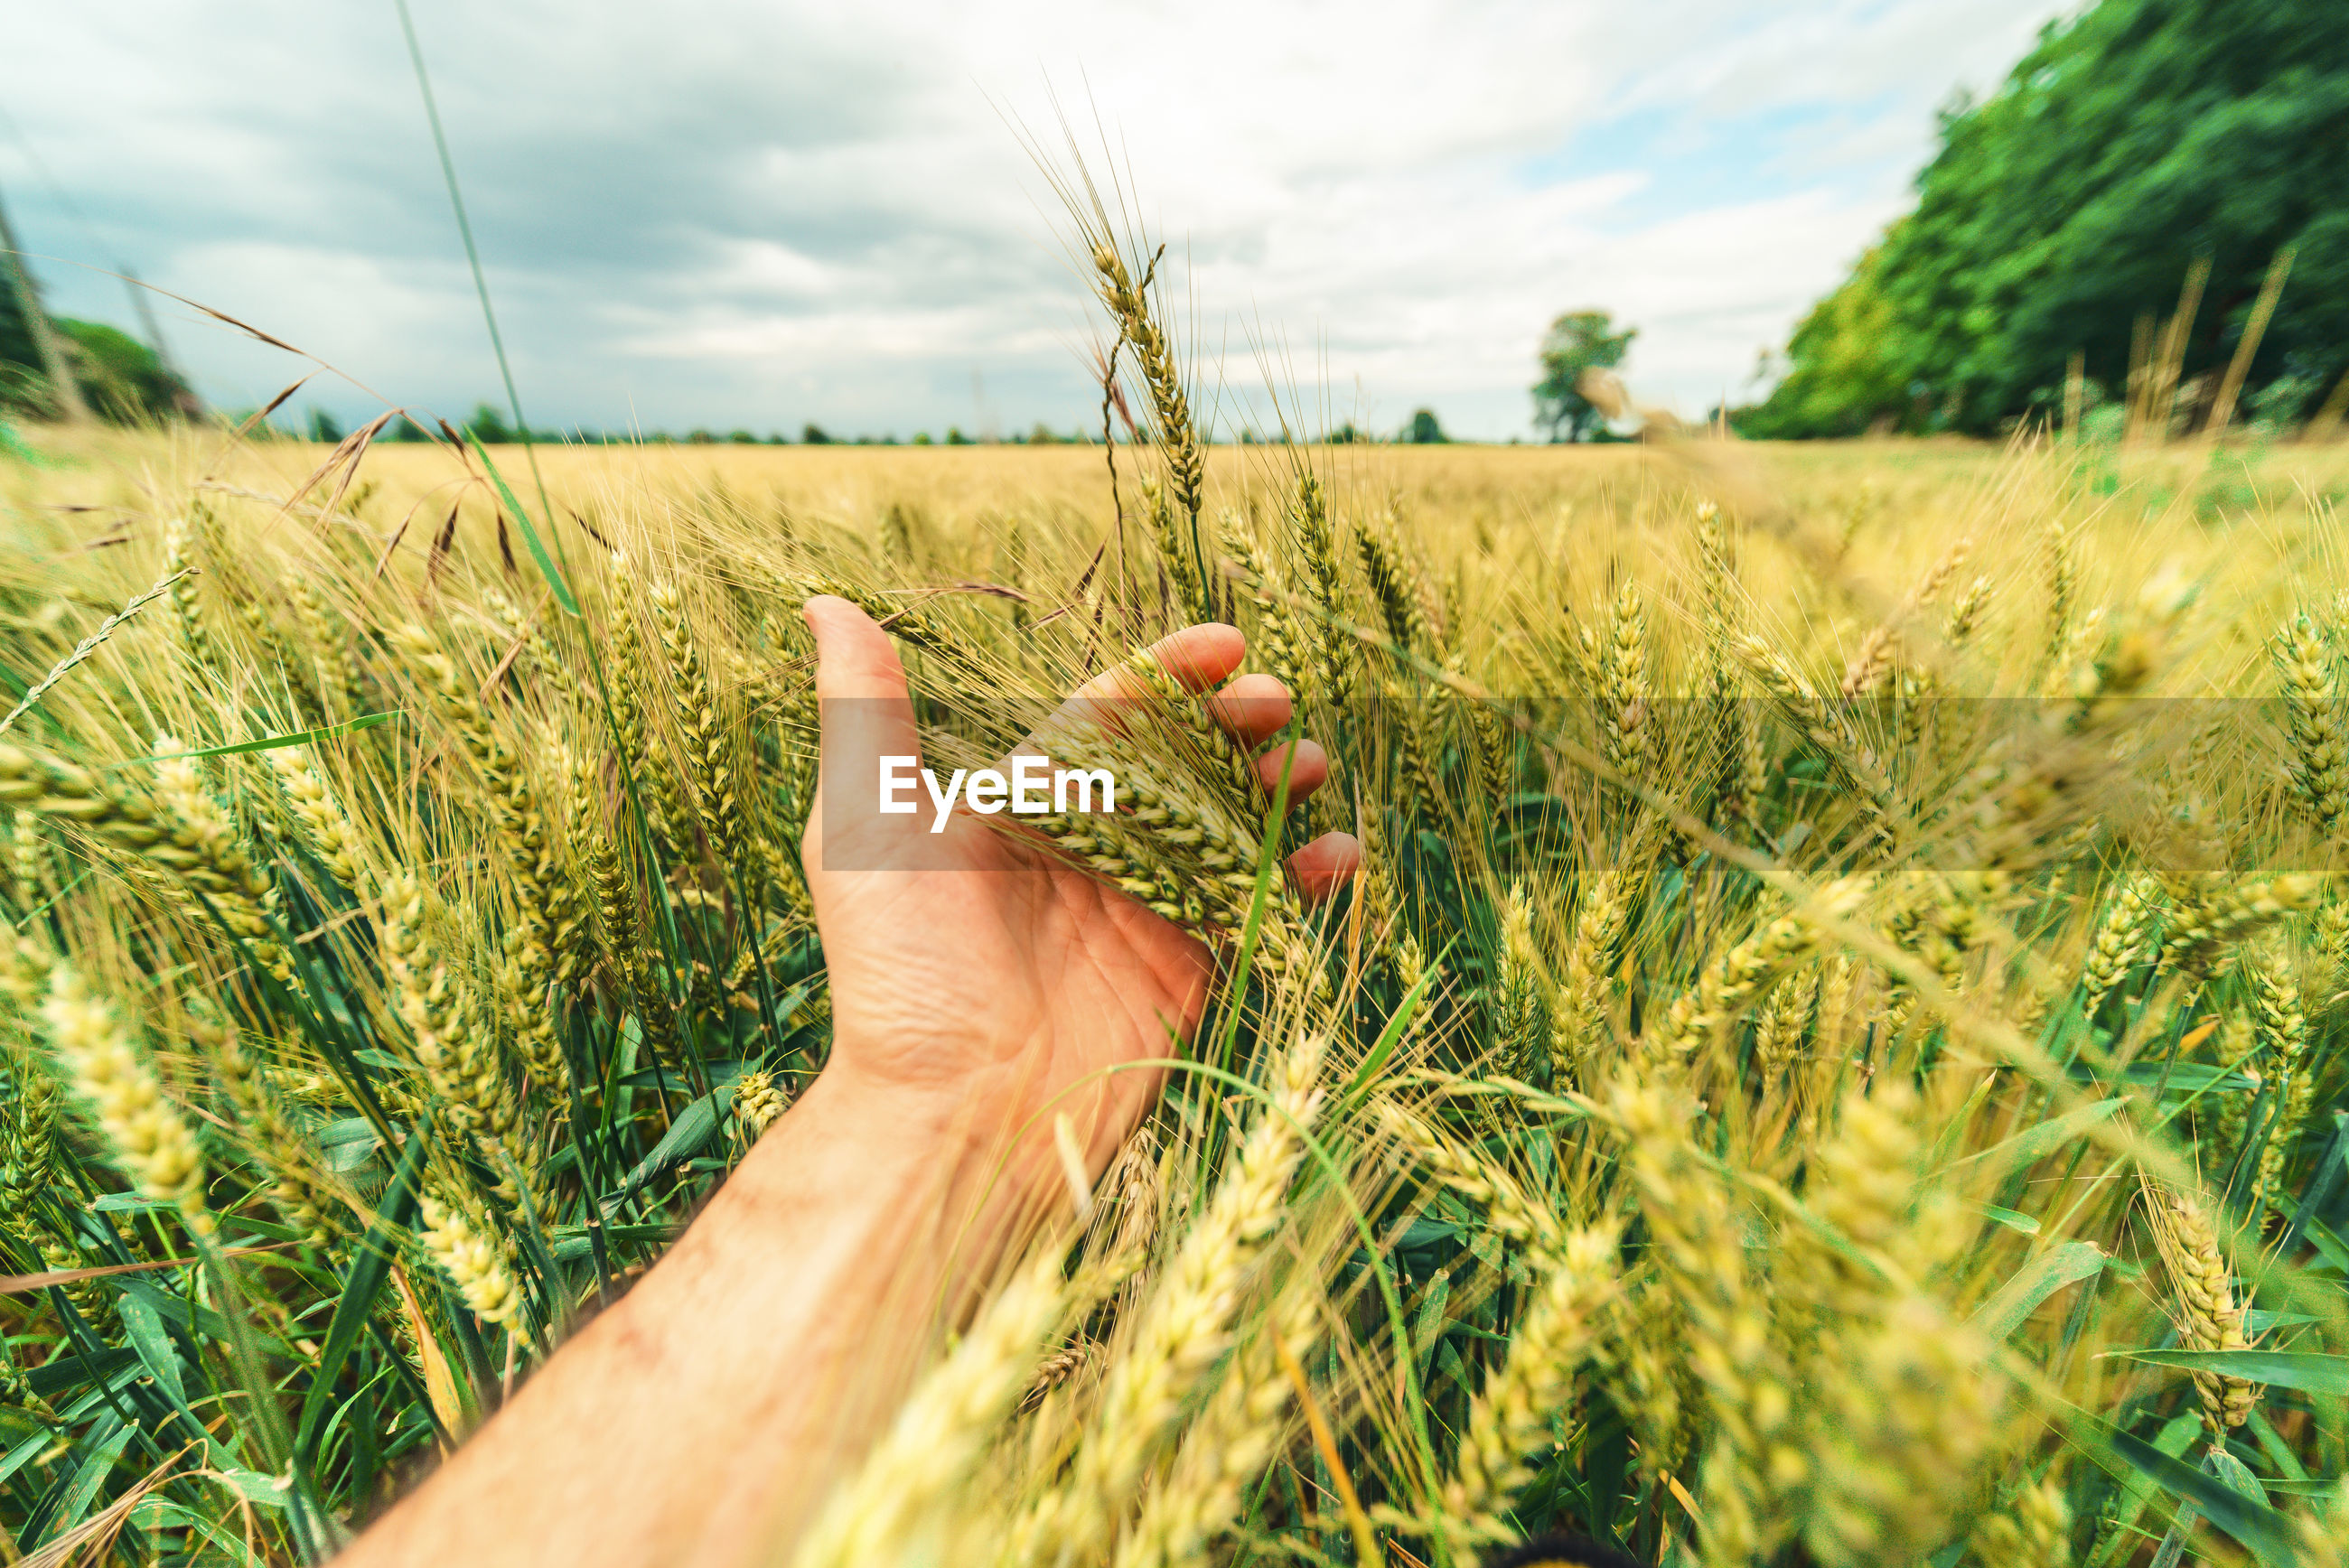 Wheat ears in a farmer's hand. harvest concept